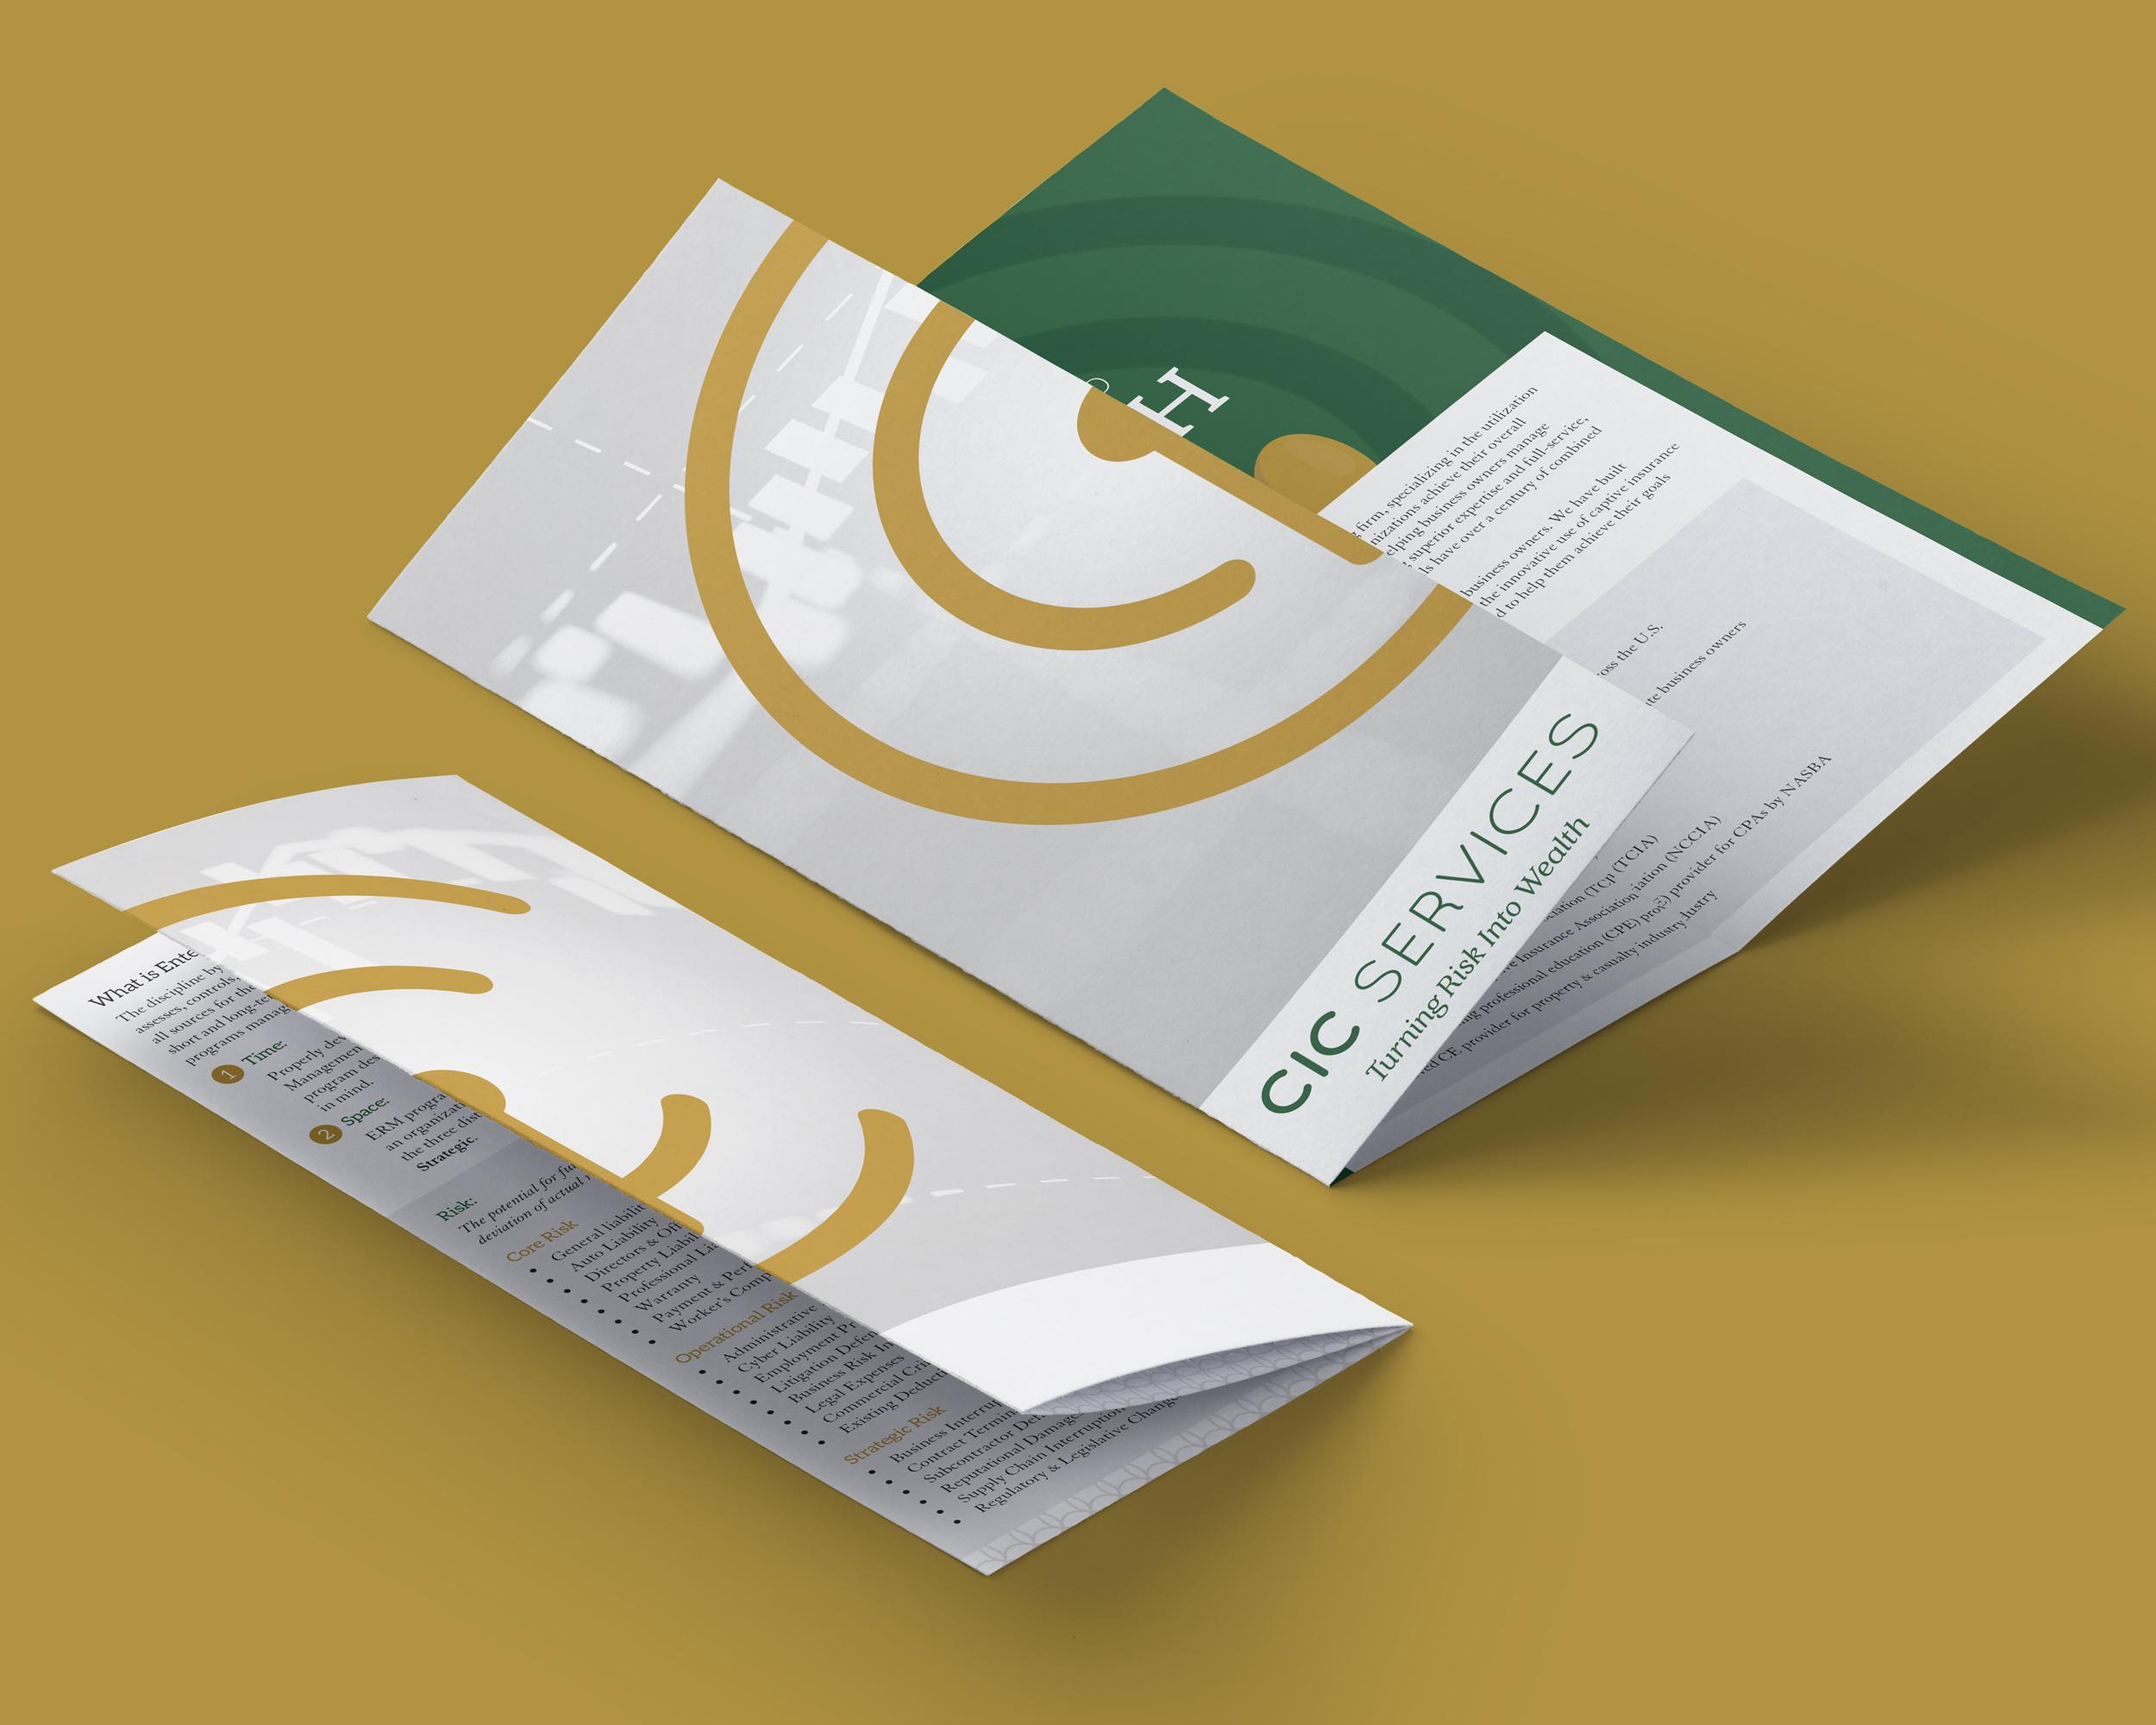 CIC_5_Brochure.jpg